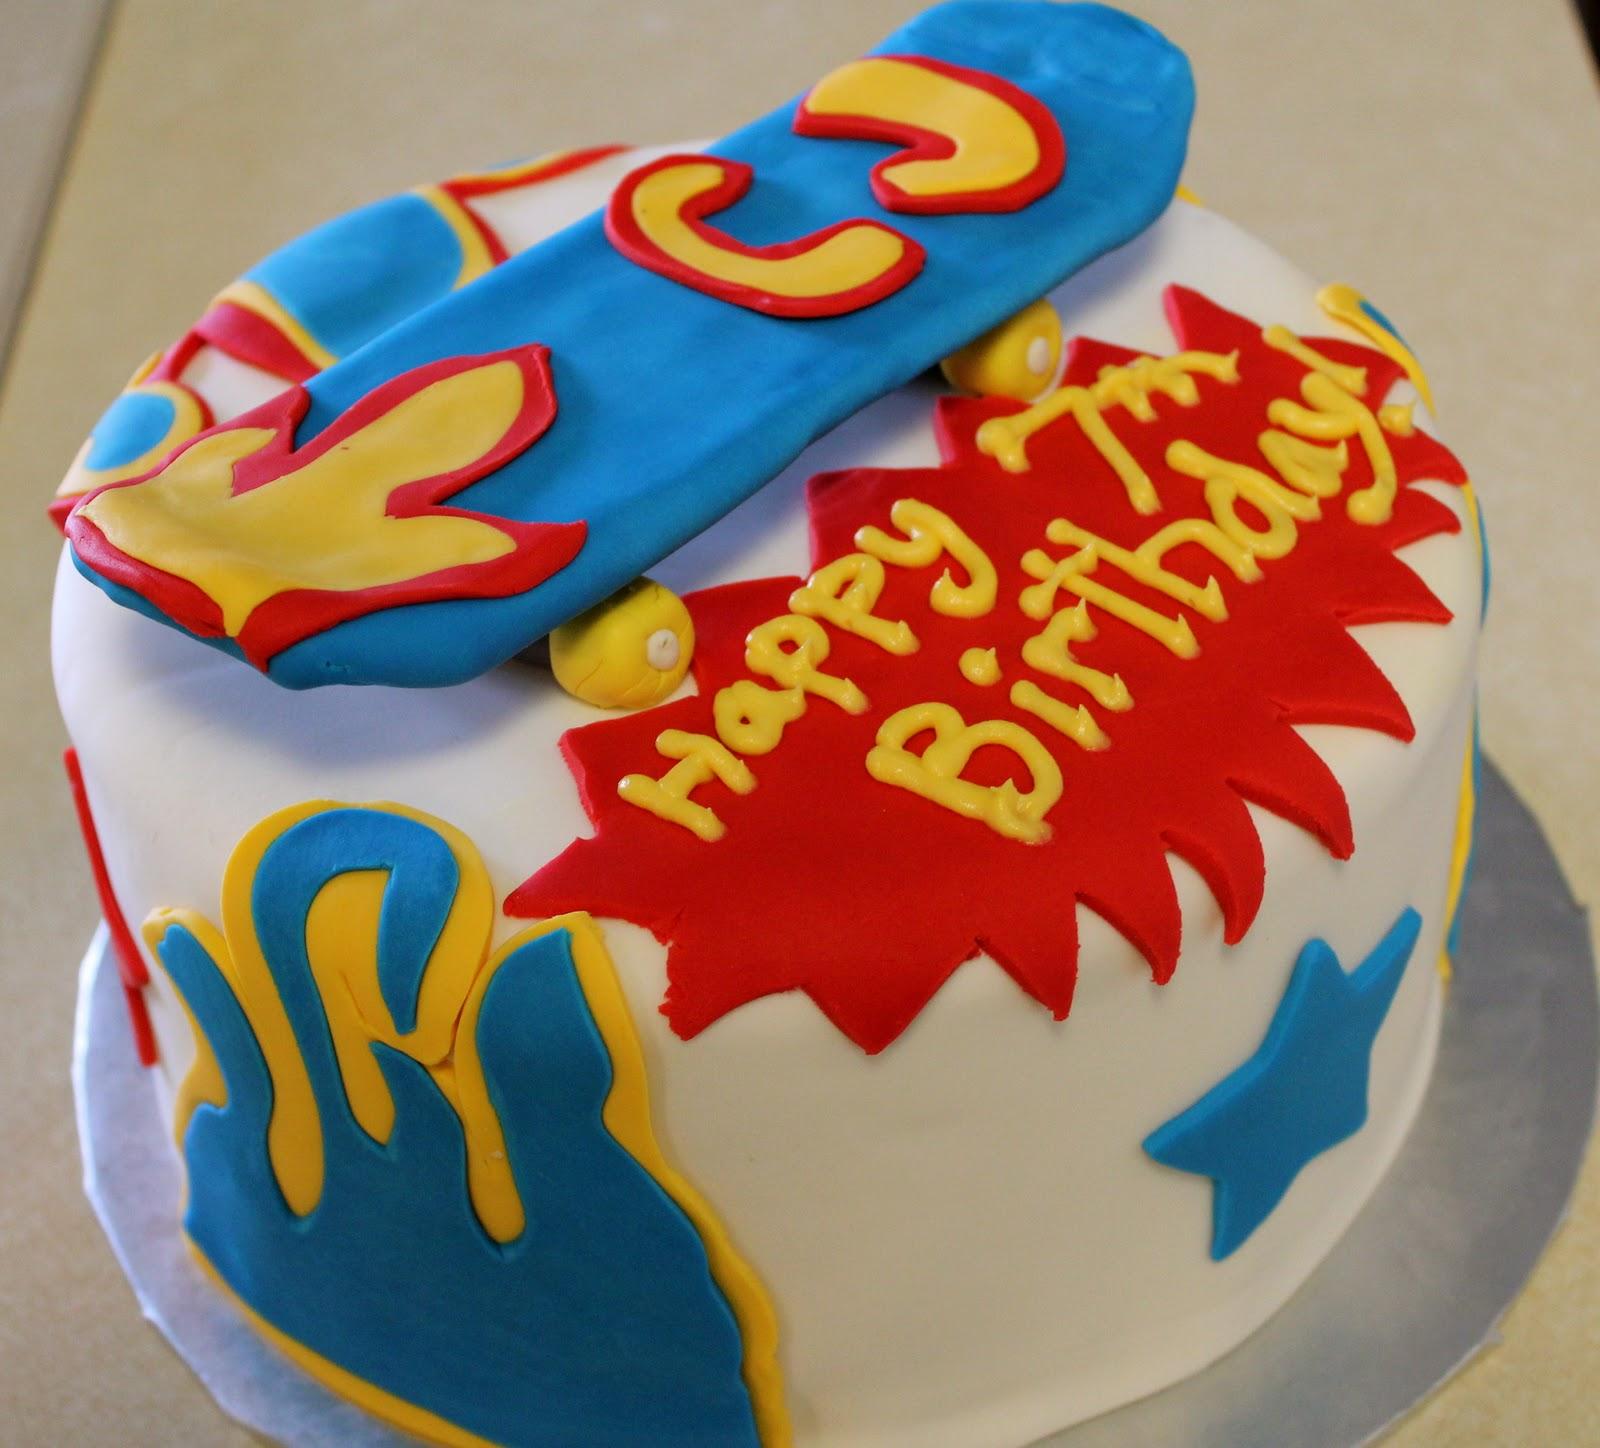 Astonishing 12 Unique Skateboard Birthday Cakes Photo Skateboard Cake Funny Birthday Cards Online Bapapcheapnameinfo